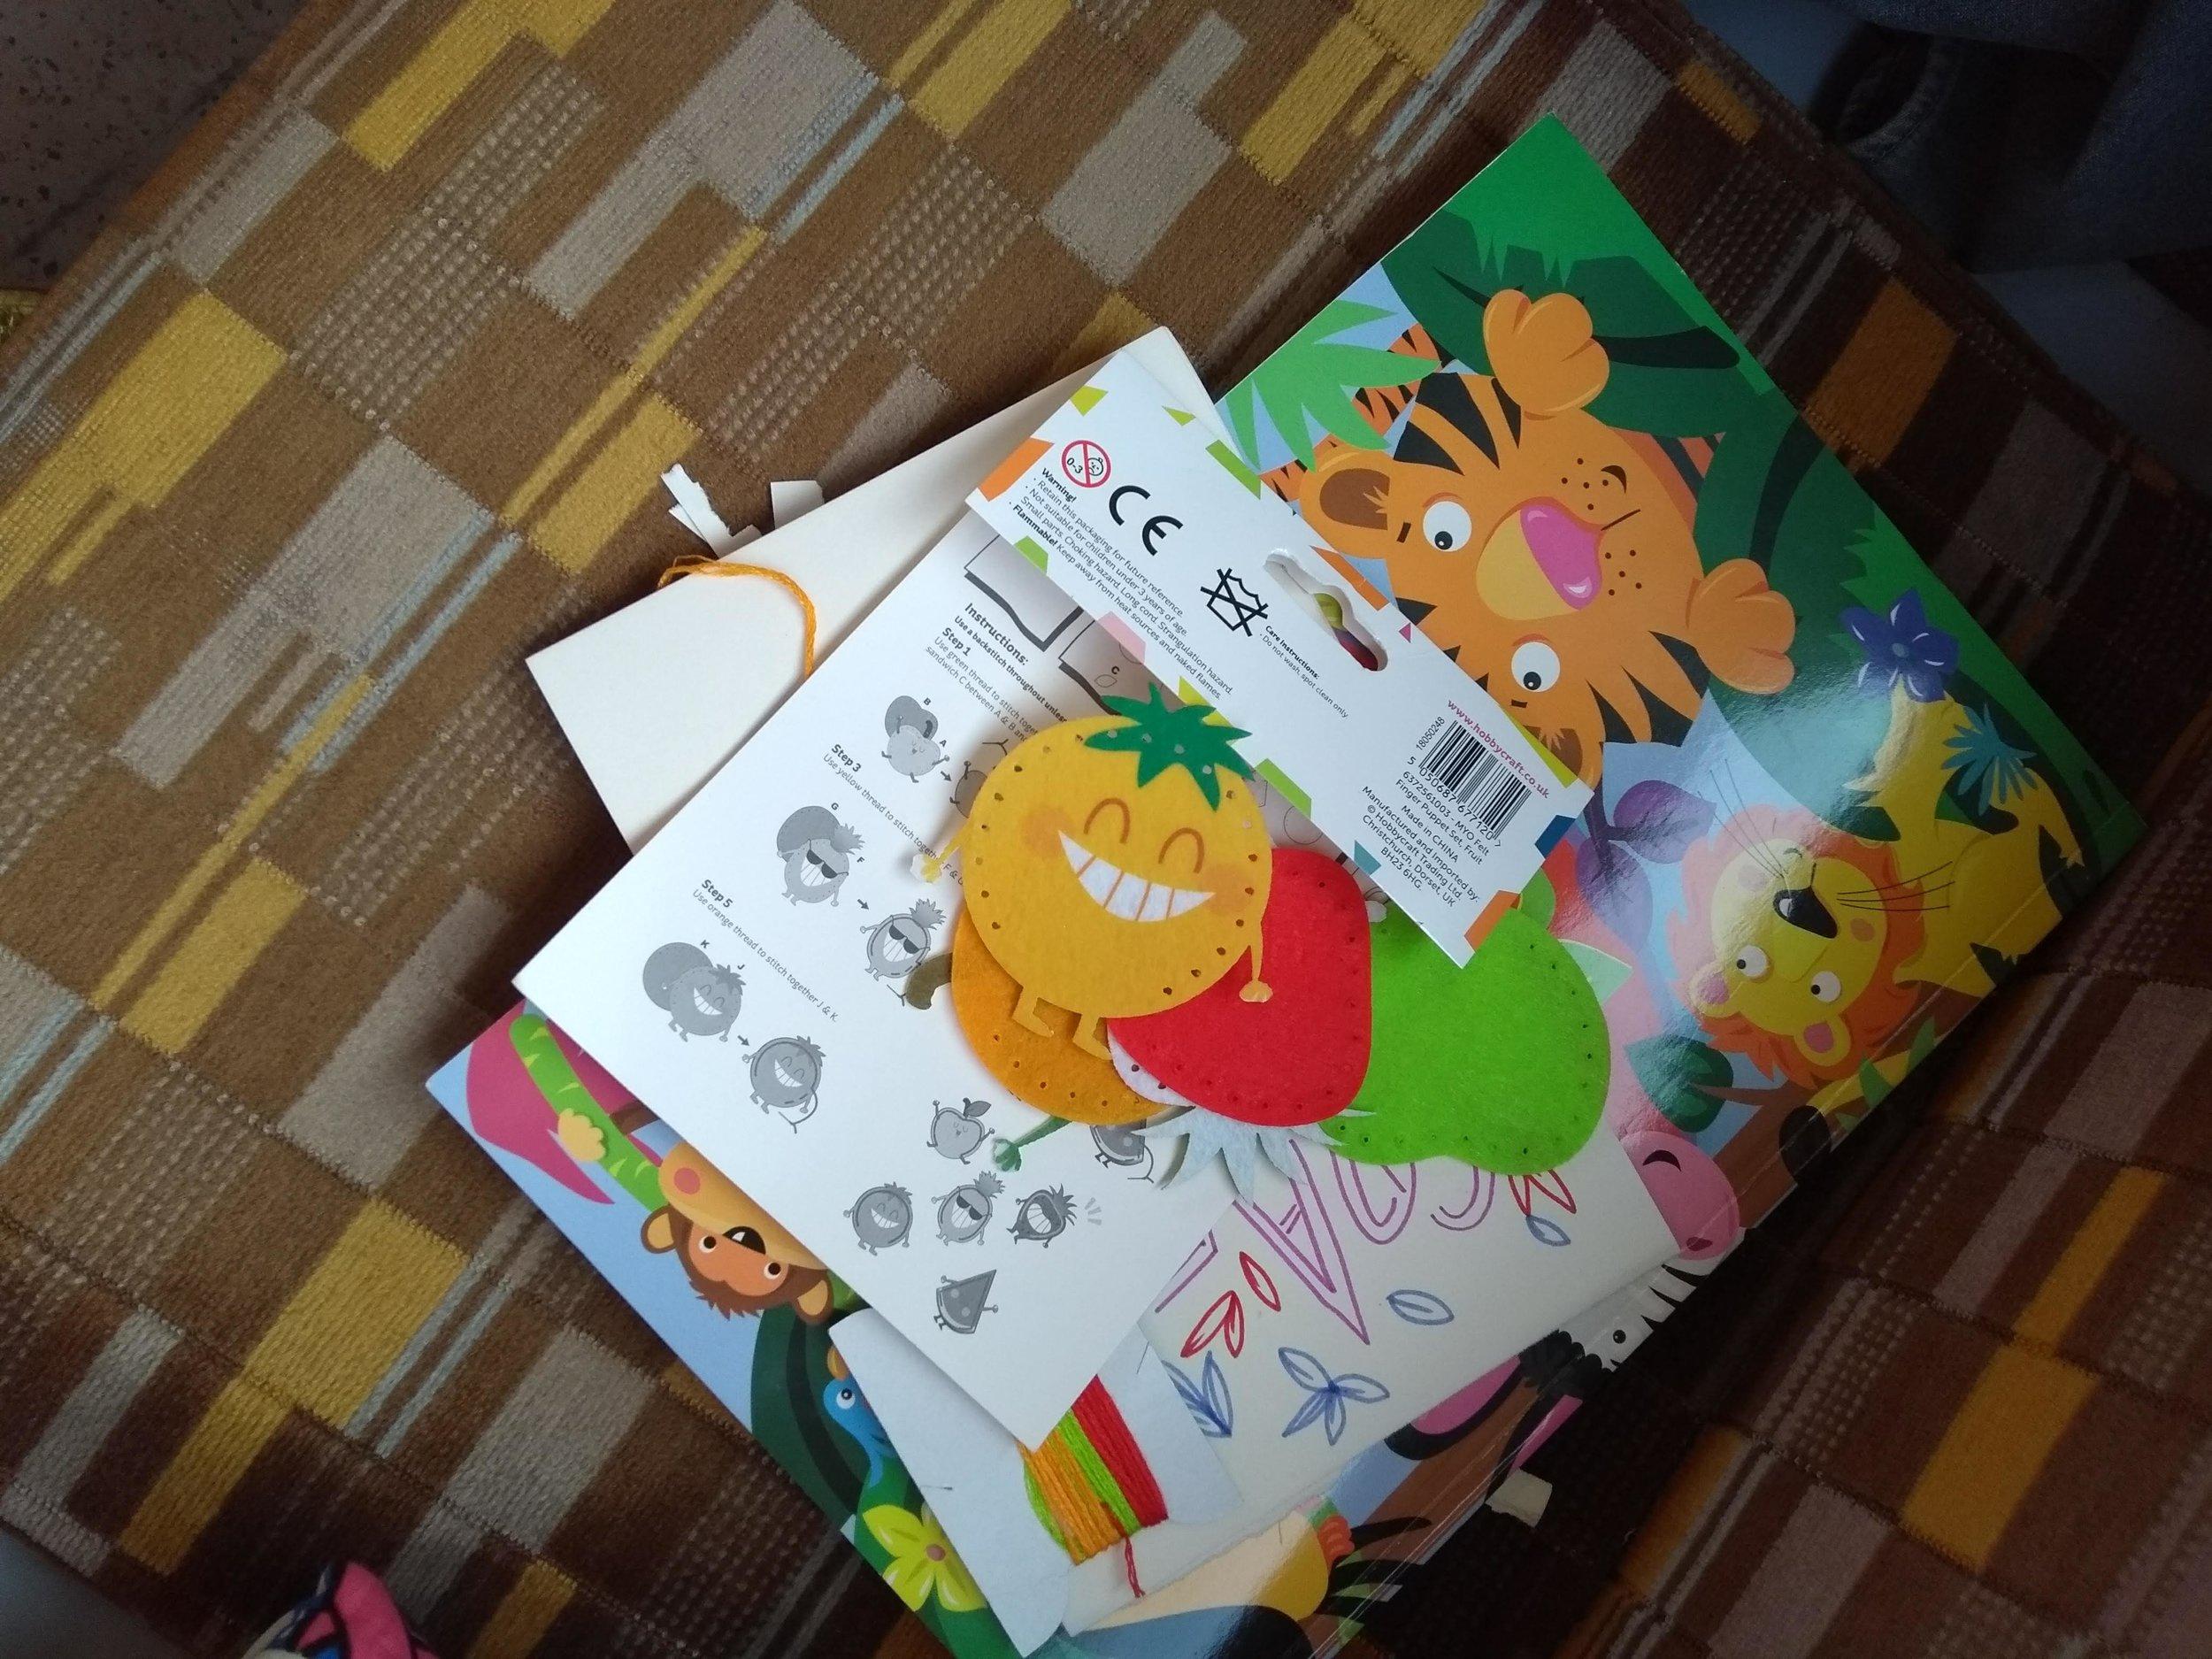 Fruity finger puppet kits from Hobbycraft giving us LIFE!